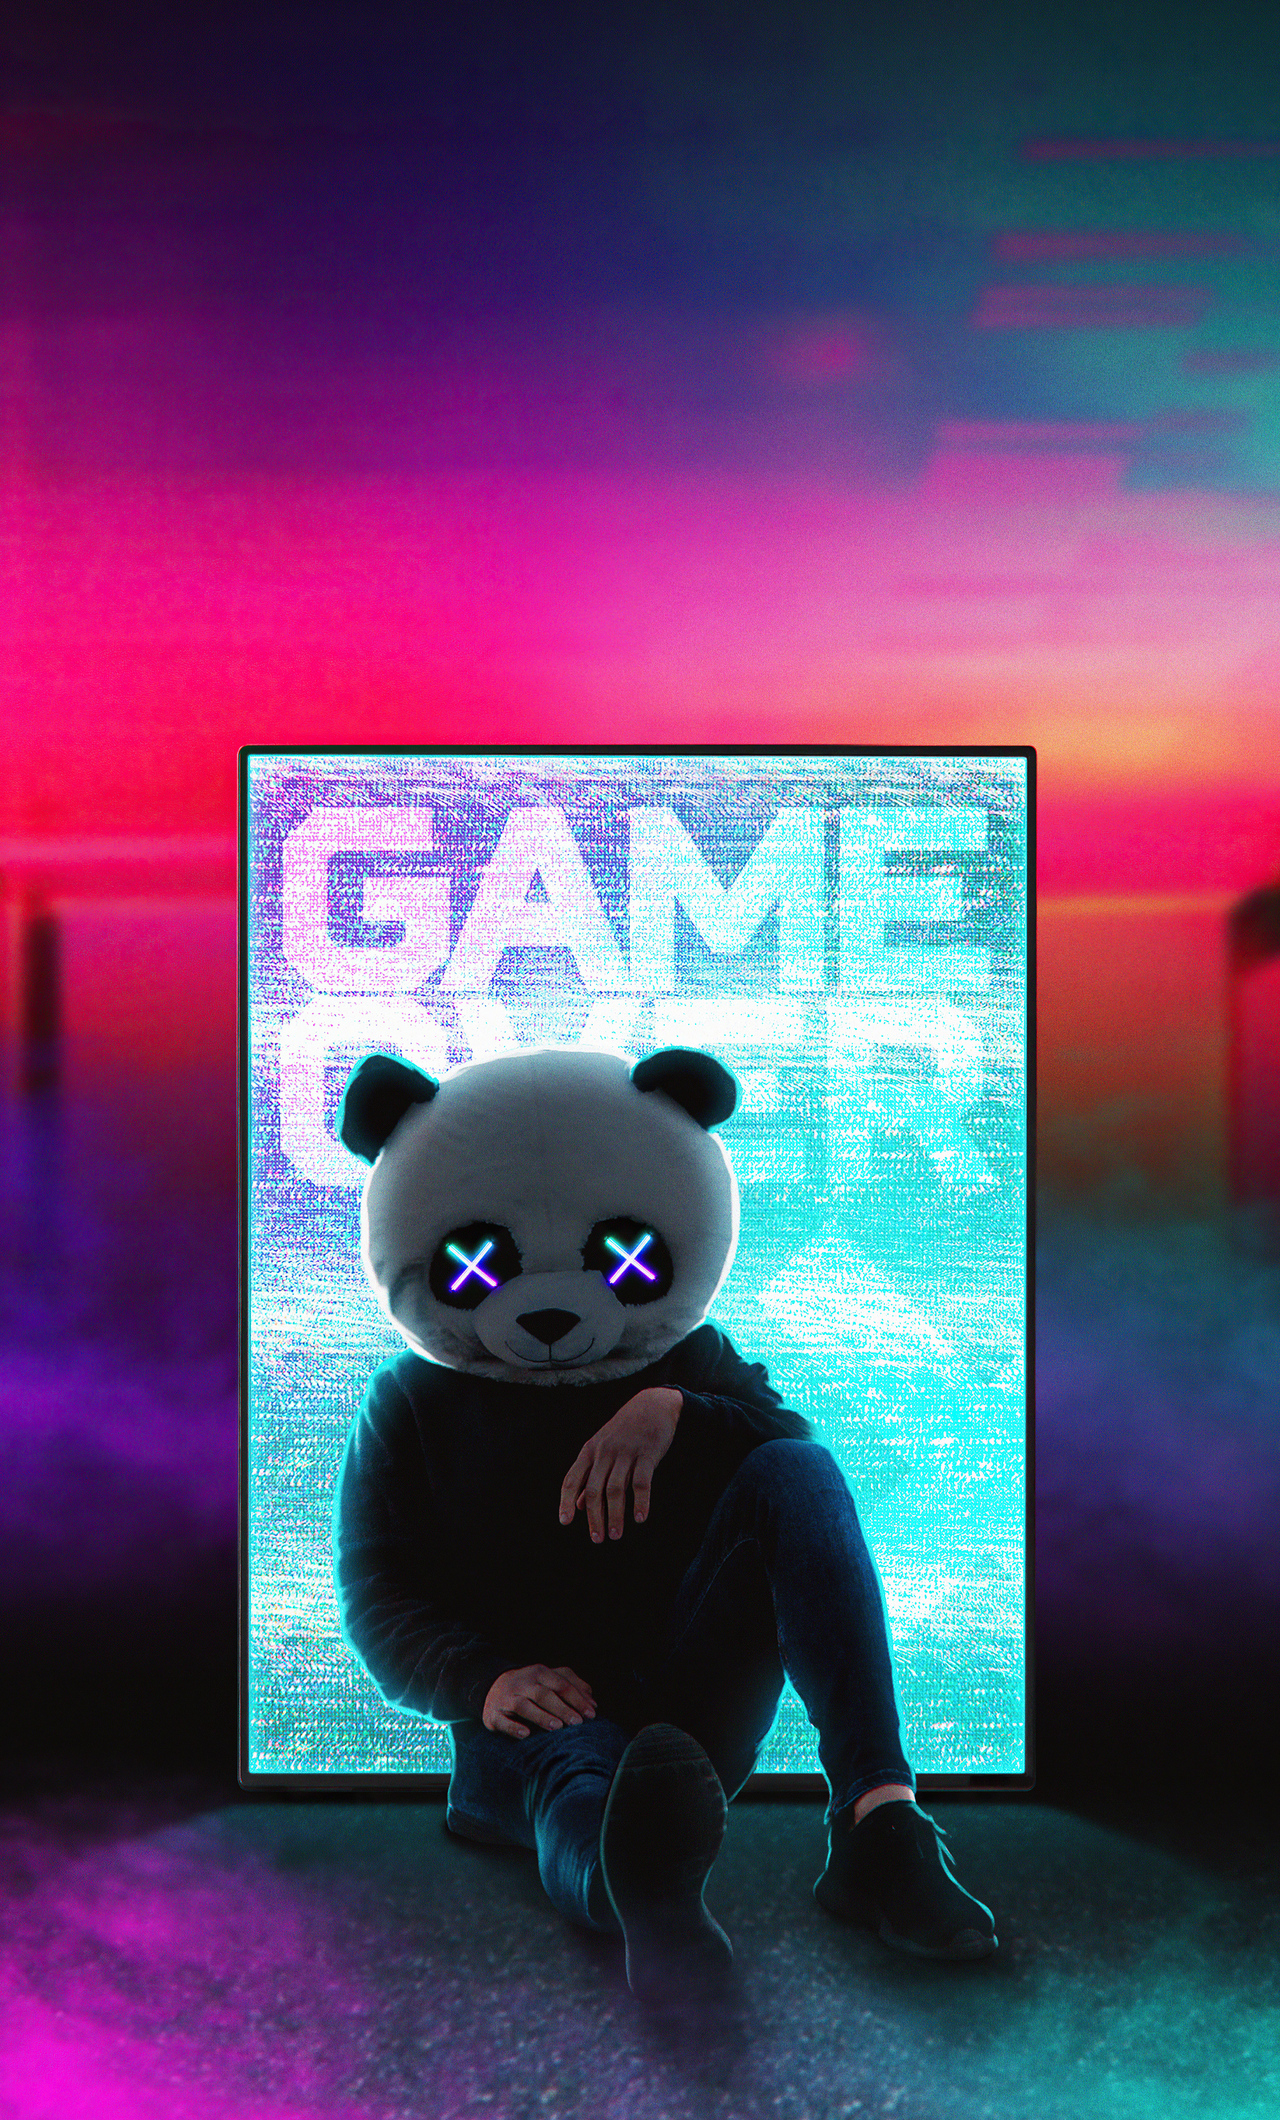 1280x2120 Panda With No Worries iPhone 6+ HD 4k Wallpapers ...